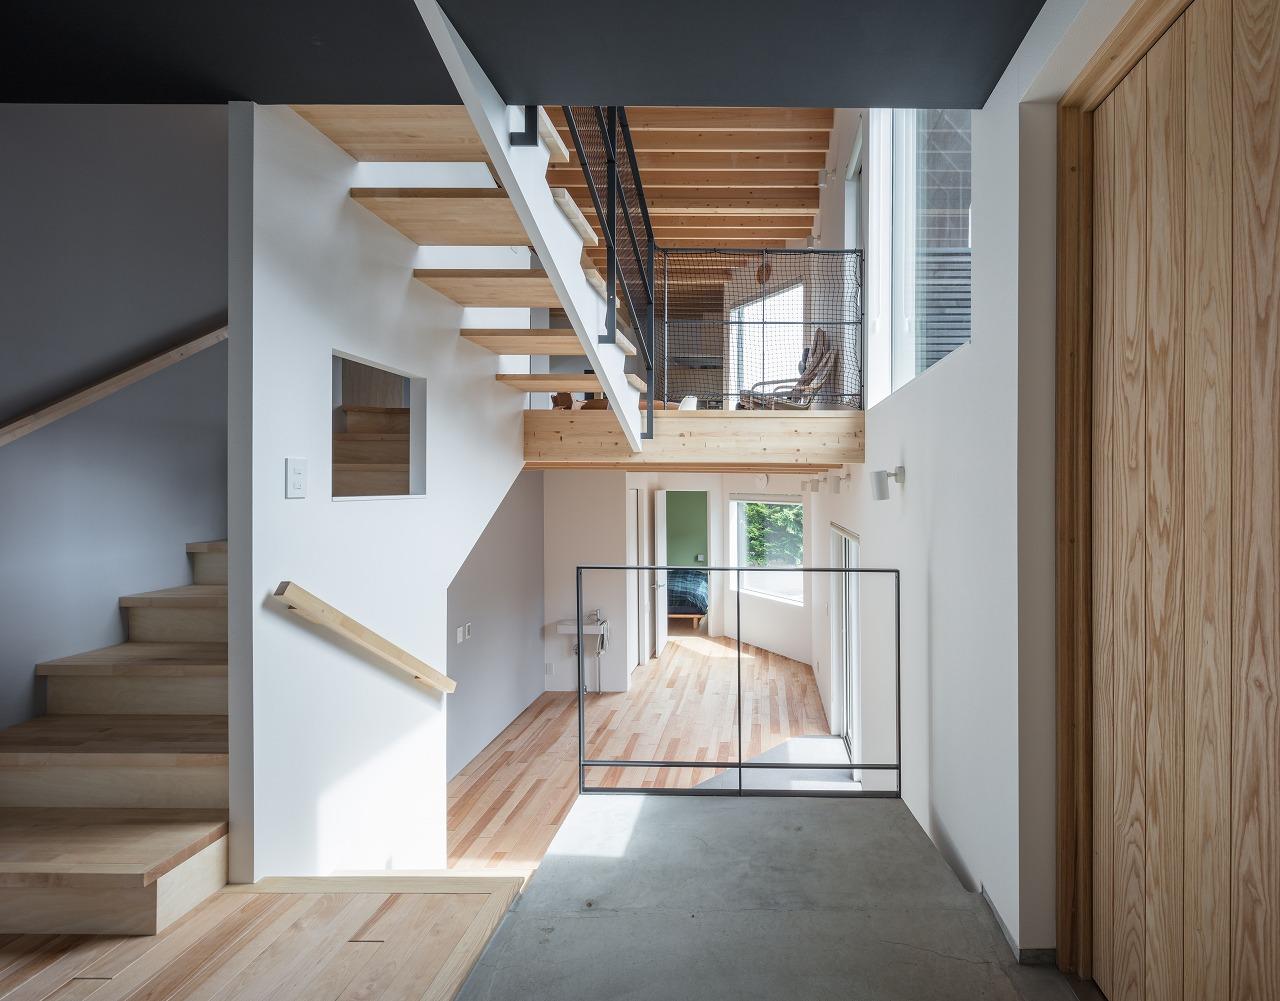 Photolog 007 Four Decks スキップフロアを見通す玄関